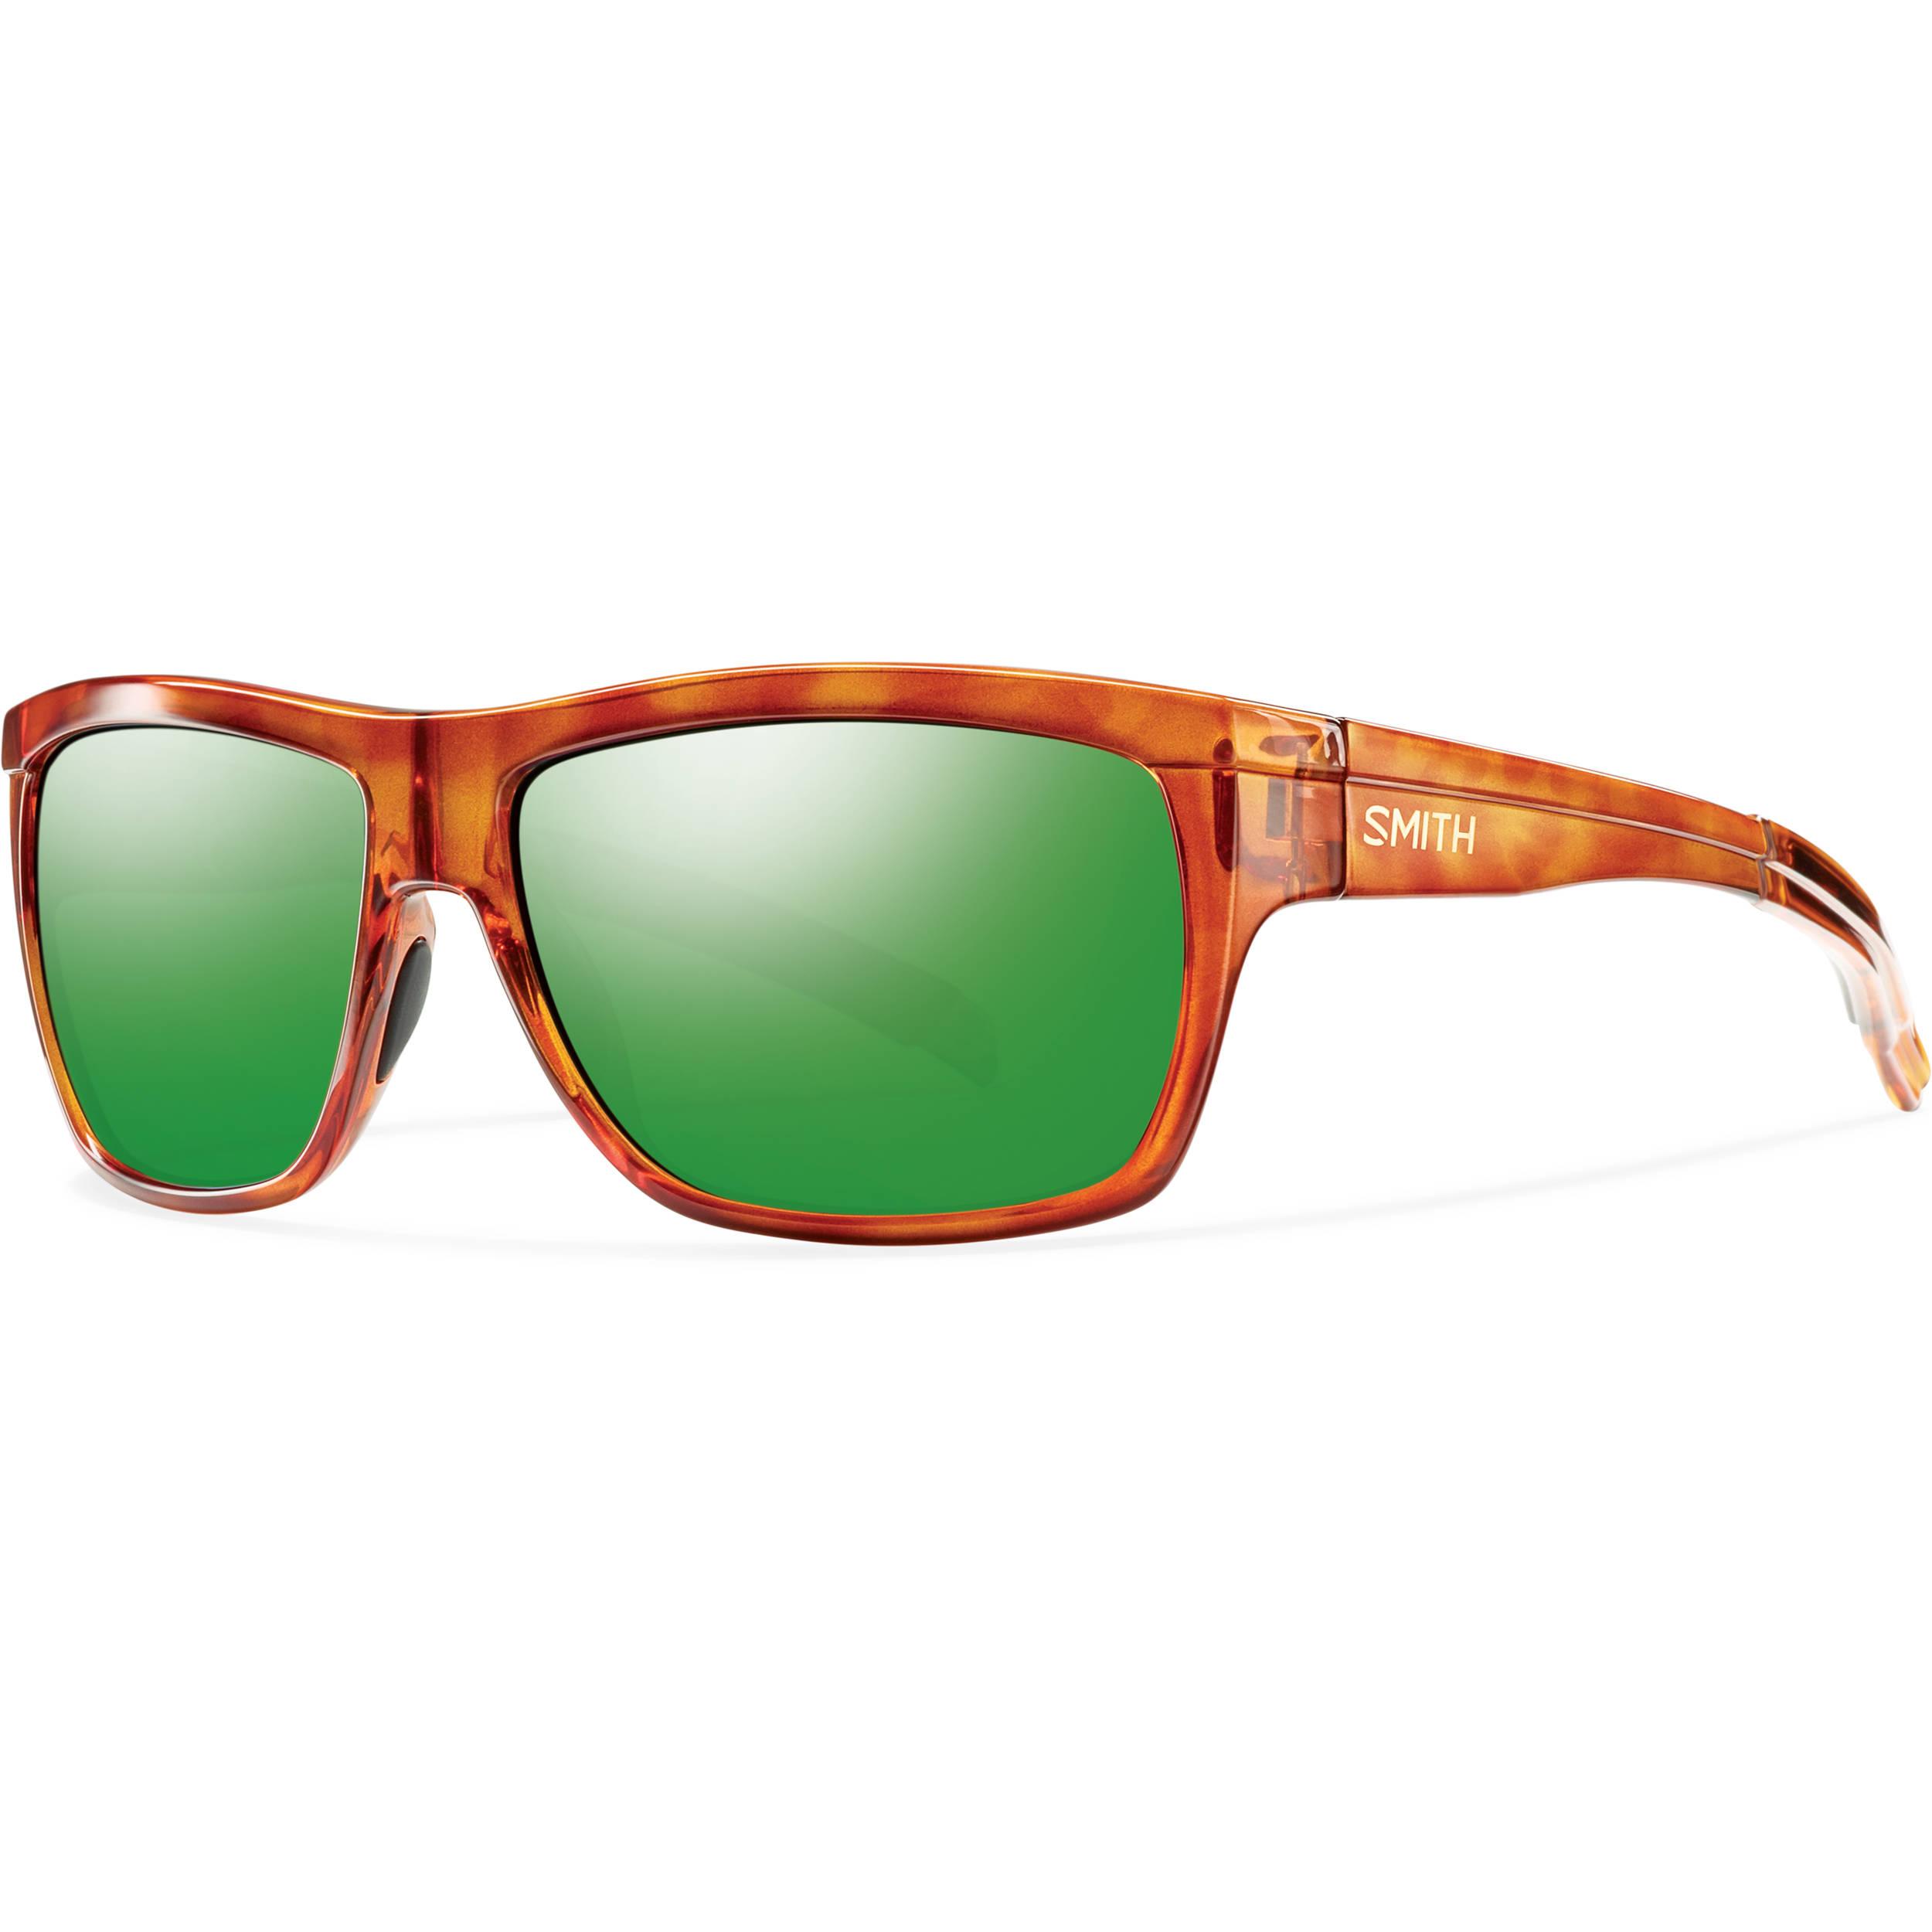 72881d93a82 Smith Optics Men s Mastermind Sunglasses (Polarized Green Sol-X Mirror  Lenses   Honey Tortoise Frames)